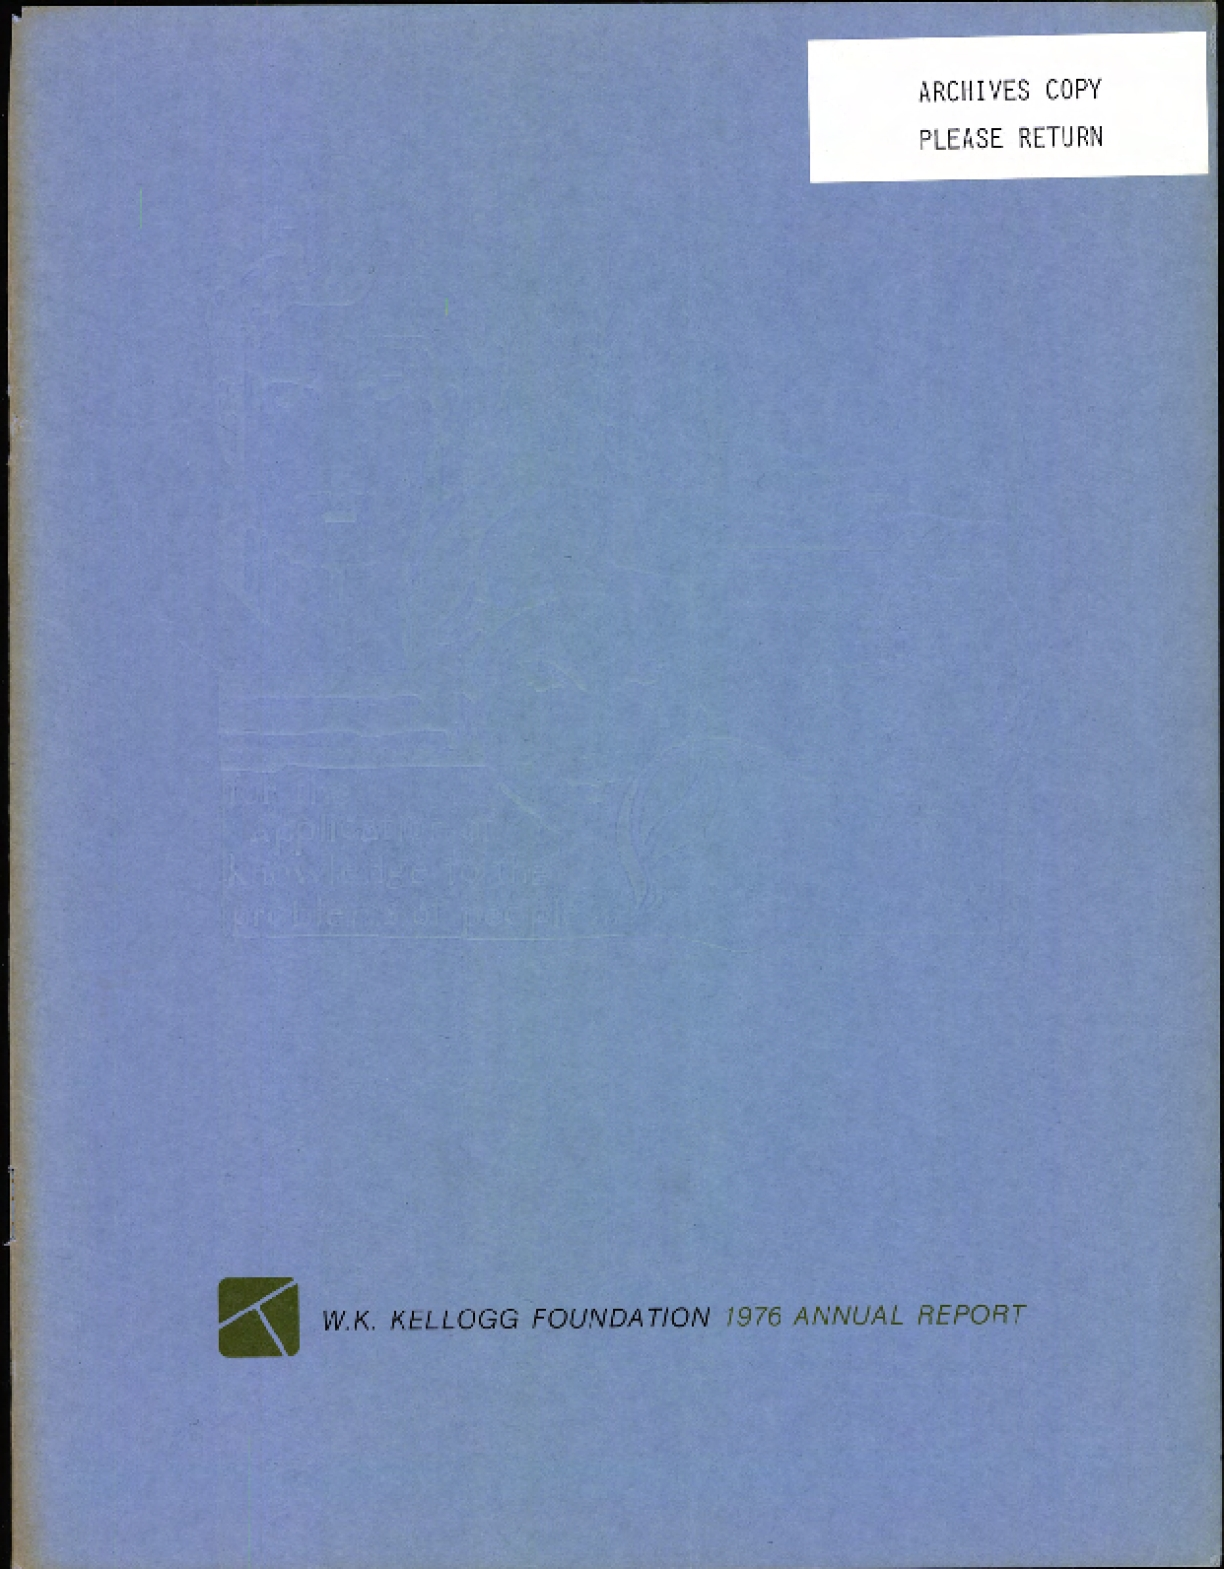 1976 W.K. Kellogg Foundation Annual Report